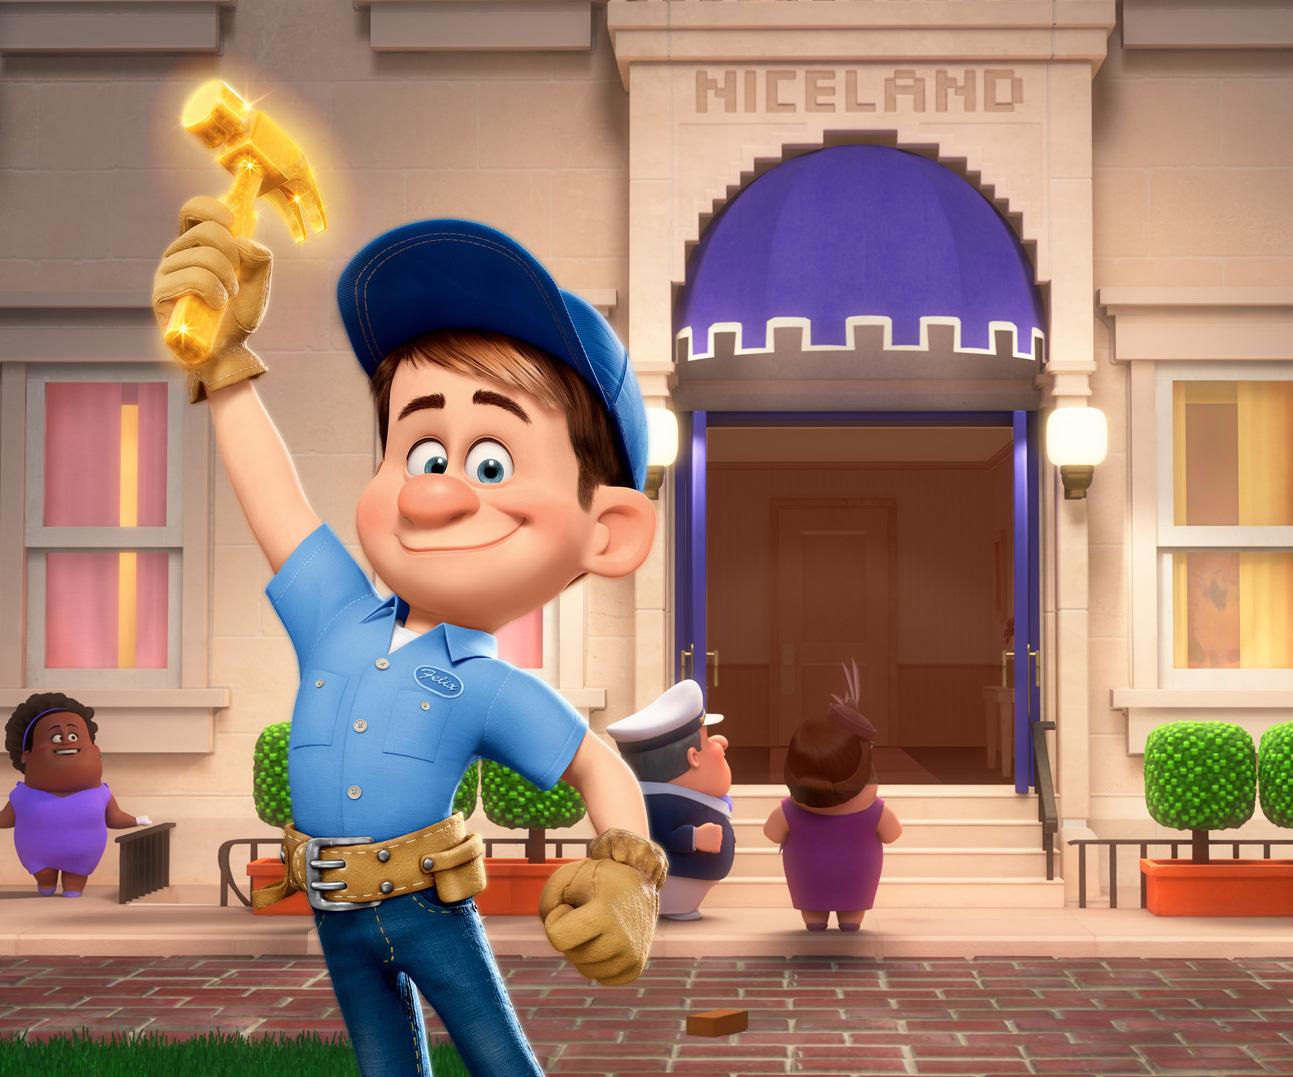 Juega a 'Repara Félix Jr.' con esta app de Disney y ¡Rompe Ralph! para iPhone e iPad